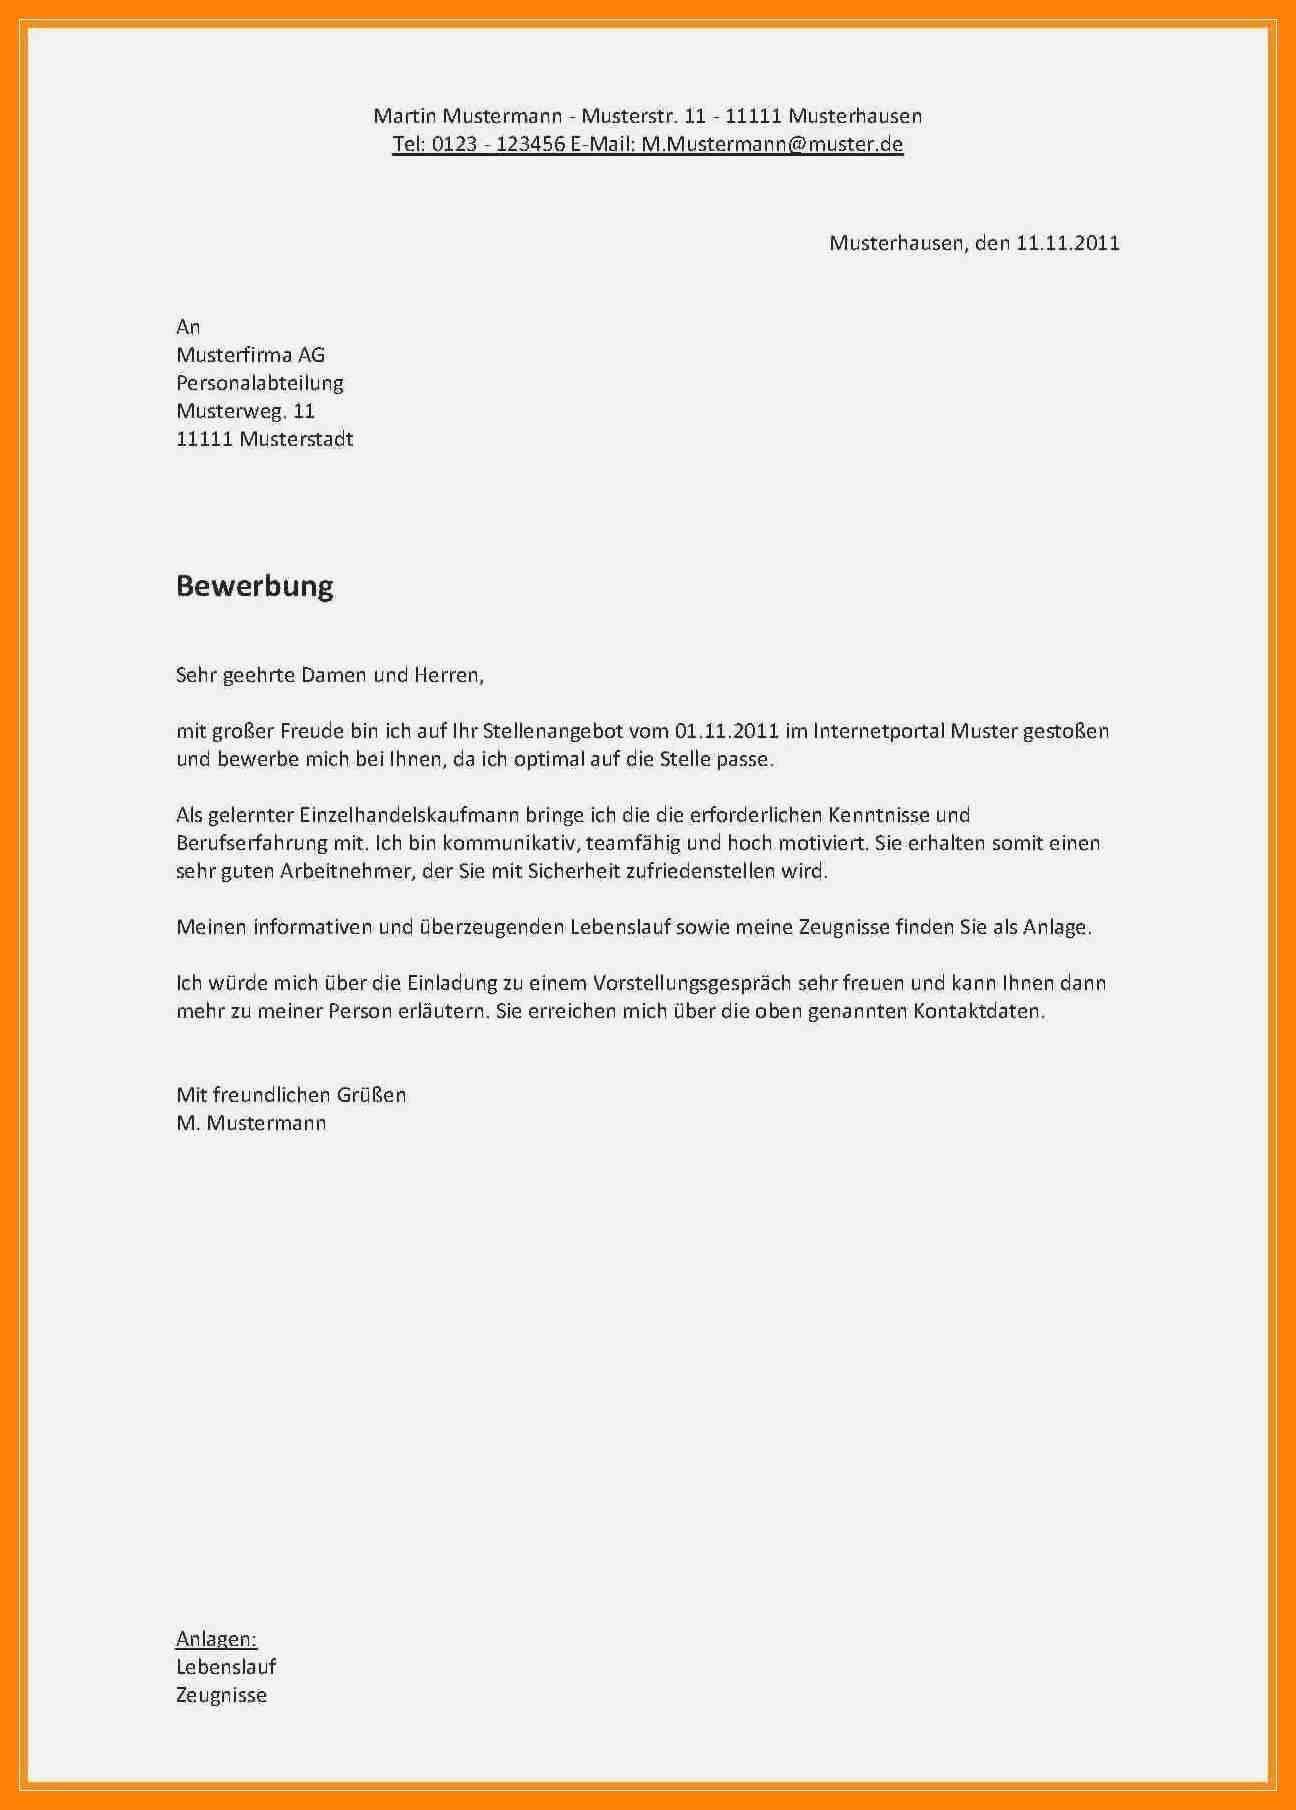 Pin Von Shalini Shanmukh Auf German Bewerbung In 2020 Bewerbung